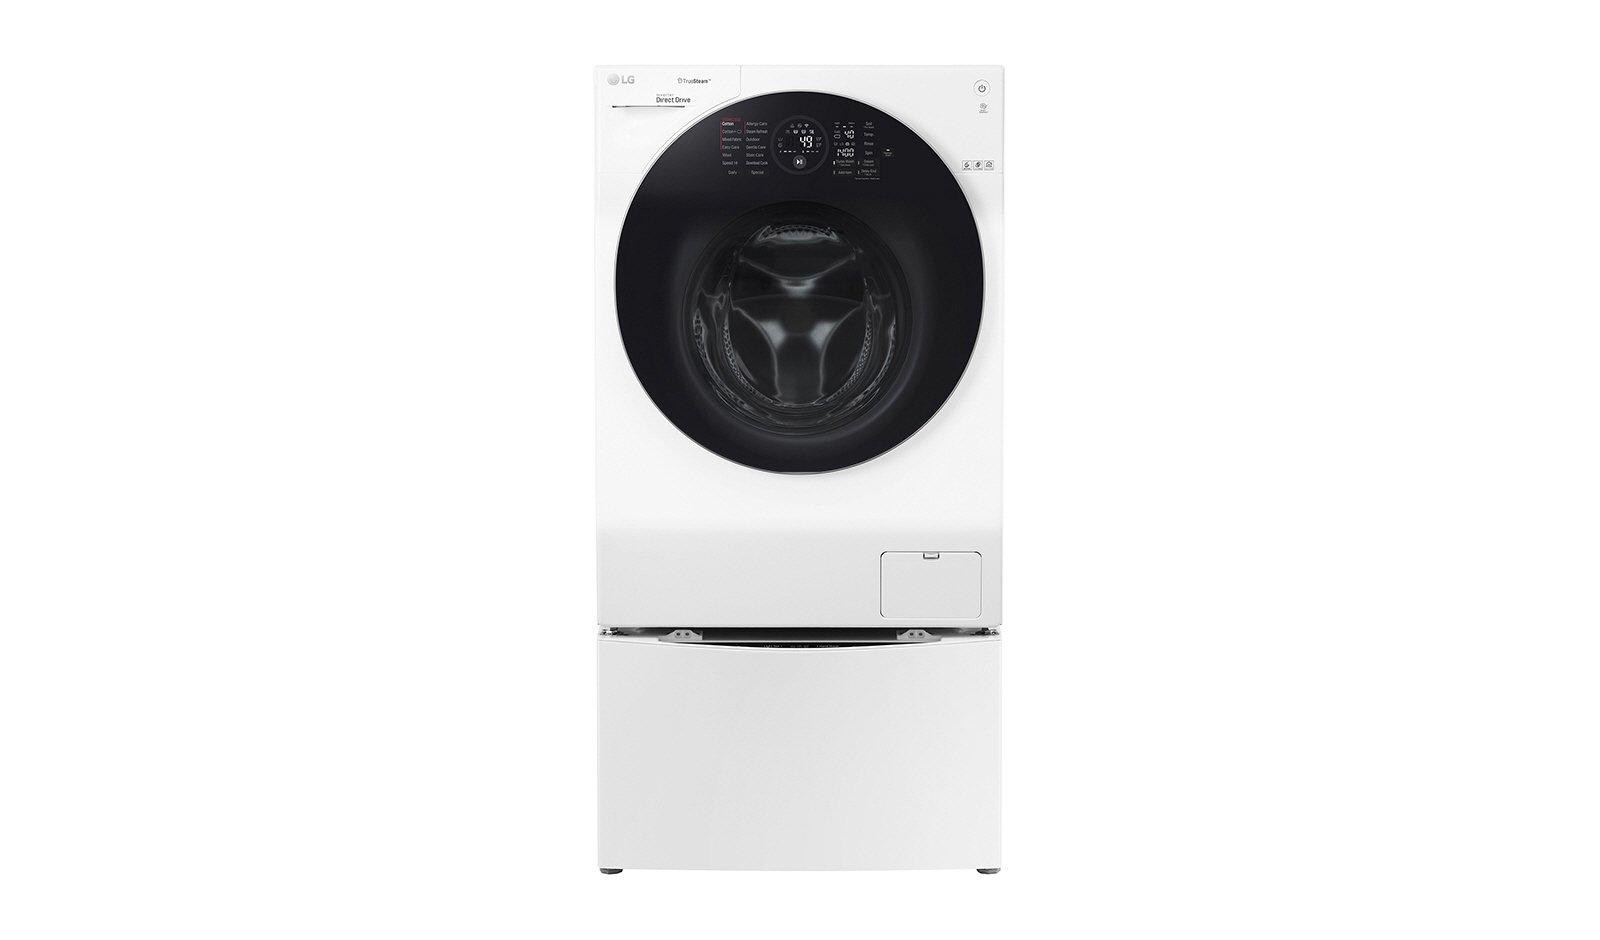 LG-f4wm10twin-autonome-Ladekabel-Premium-10-kg-1400trmin-A-40-wei-Waschmaschine–Waschmaschinen-Ladekabel-autonome-Premium-wei-Oberflche-links-LED